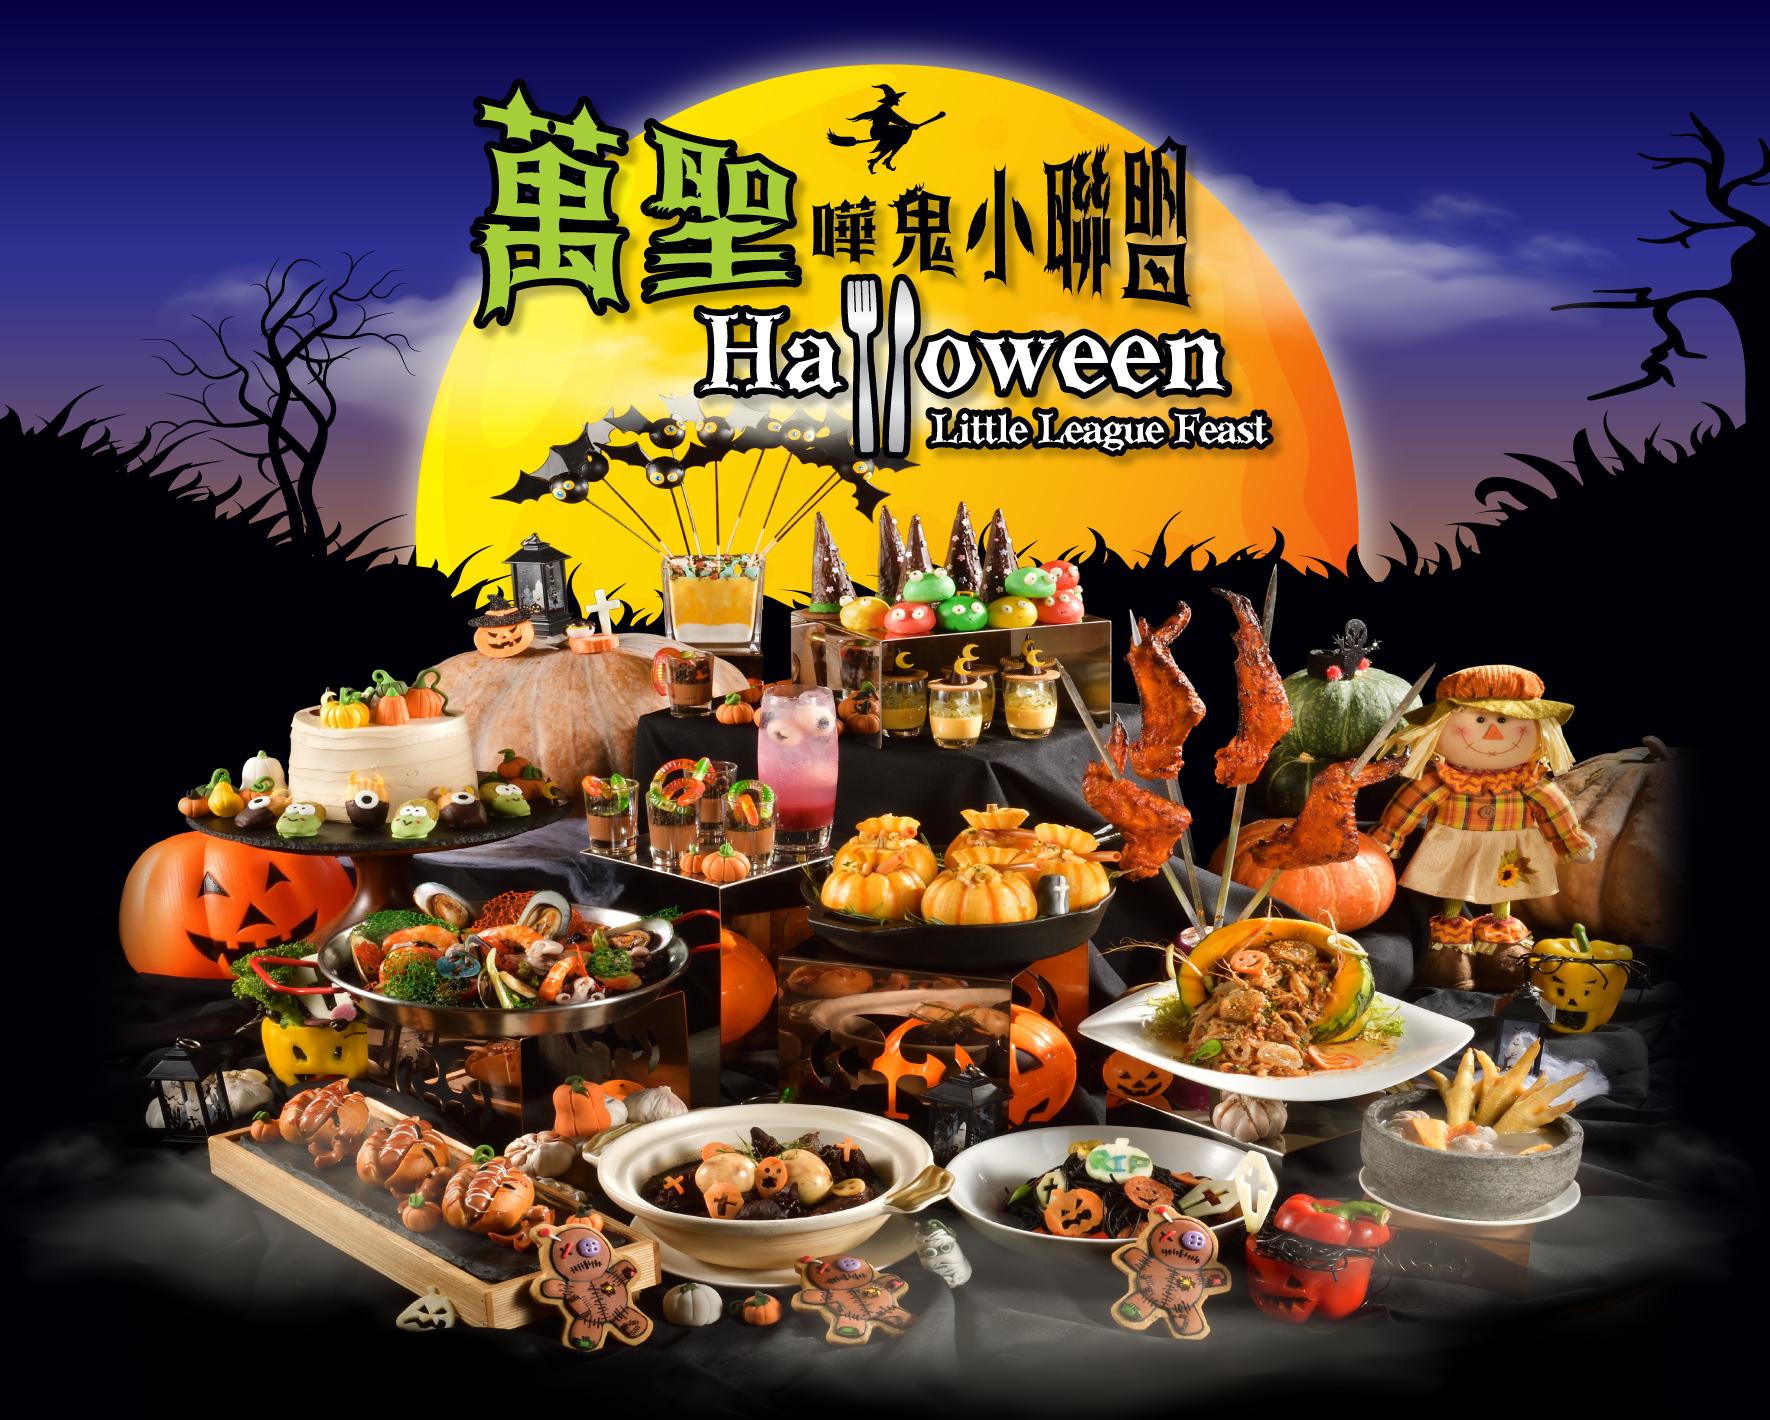 Up to 20% off on Halloween Dinner Buffet@Congress Plus